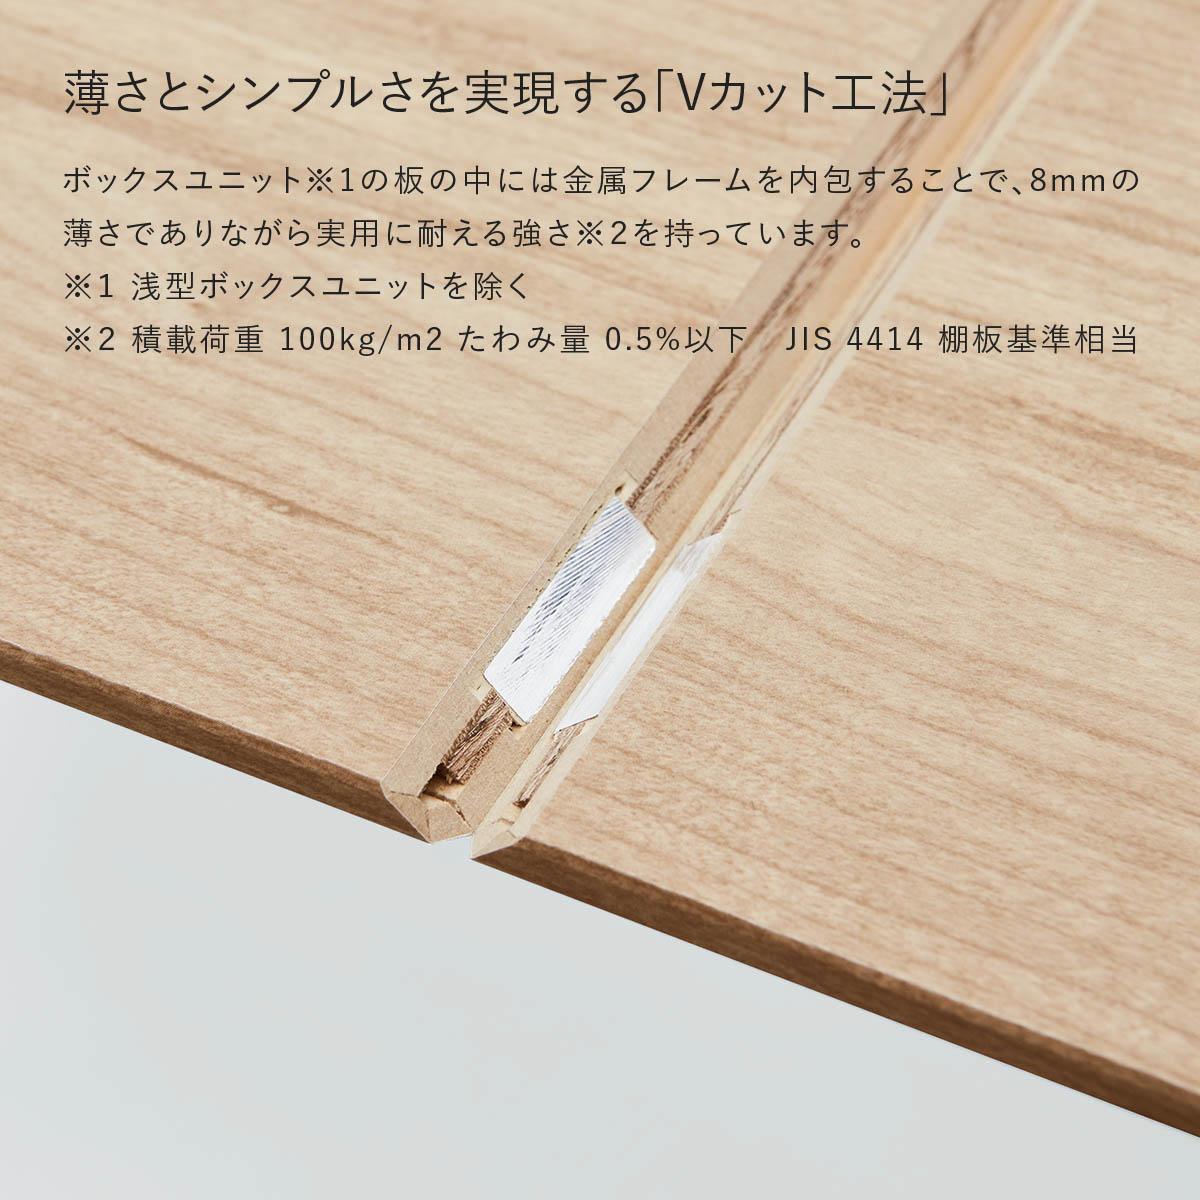 【V-TISS LIGHT  Set Plan-E】 ボックスユニットと天板によるスモールワークスペース